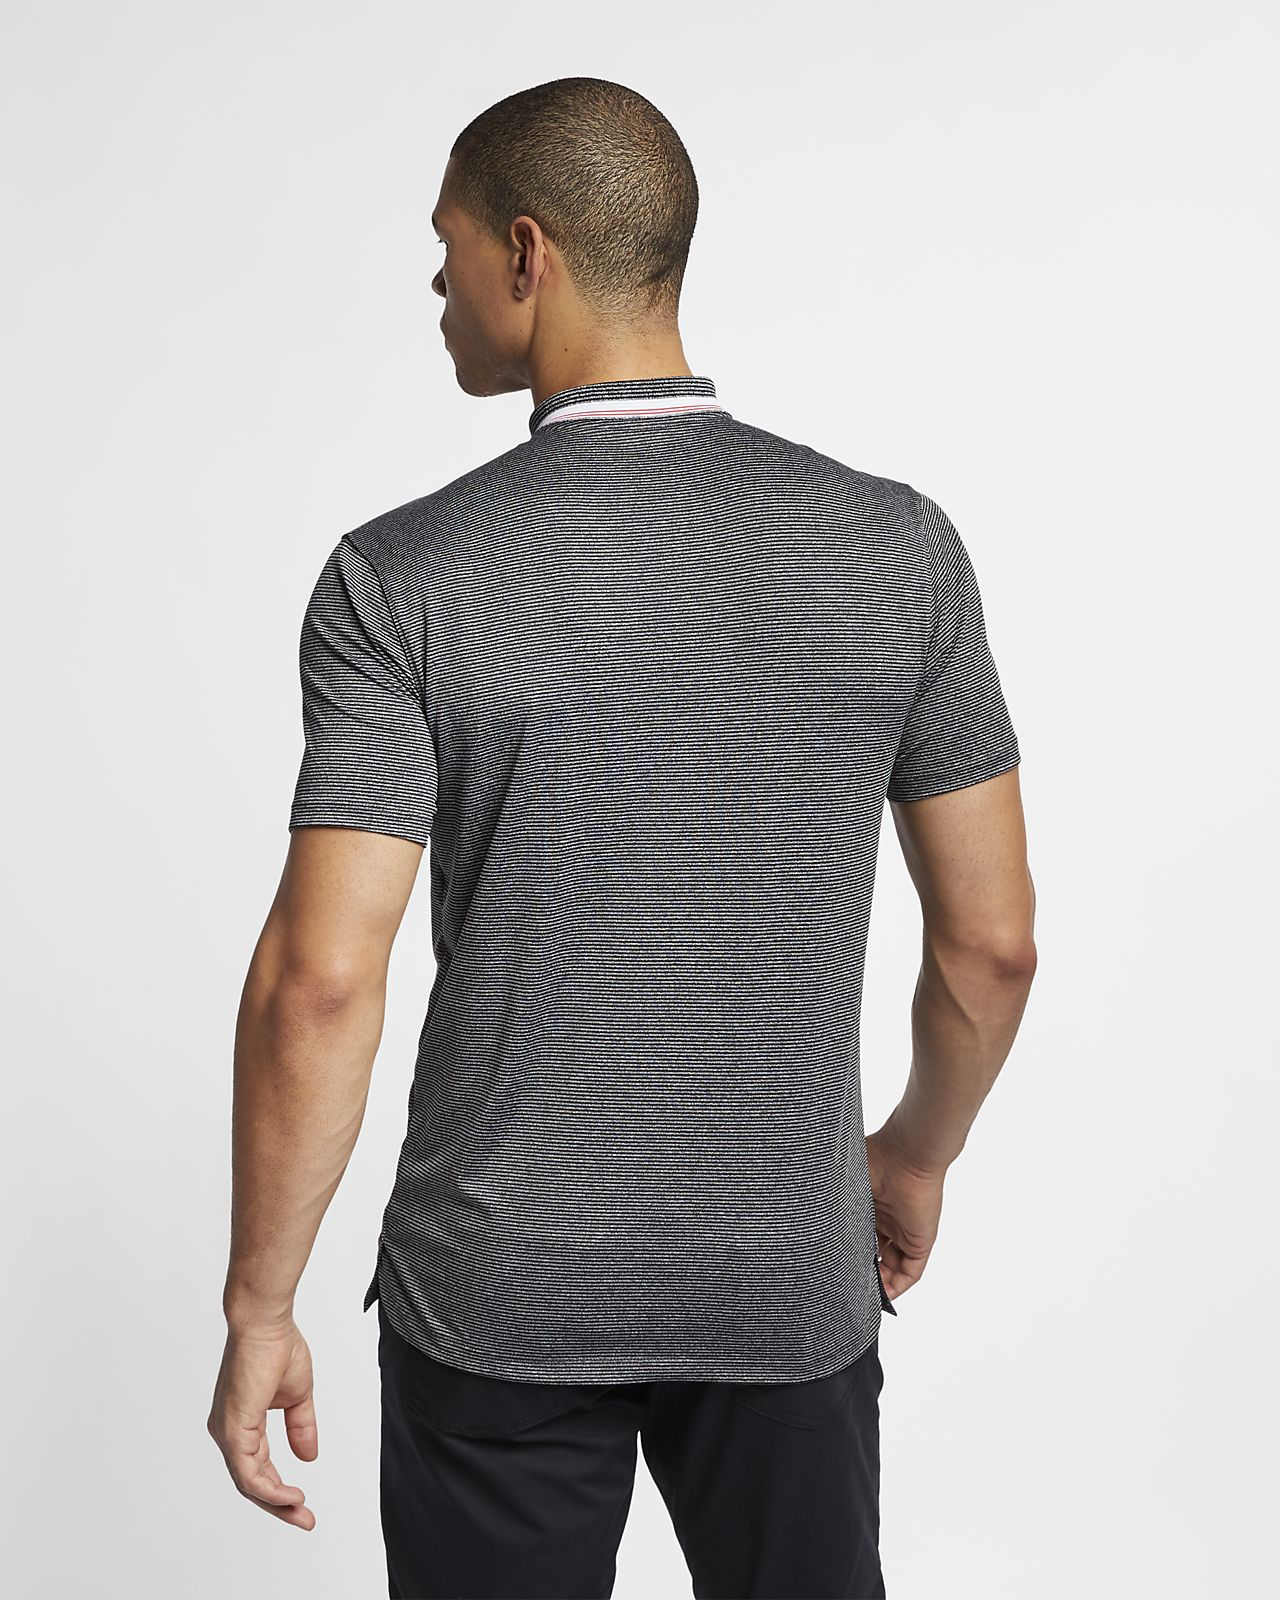 43536199 Nike Golf Mens Innovation Color Polo Shirt - DREAMWORKS